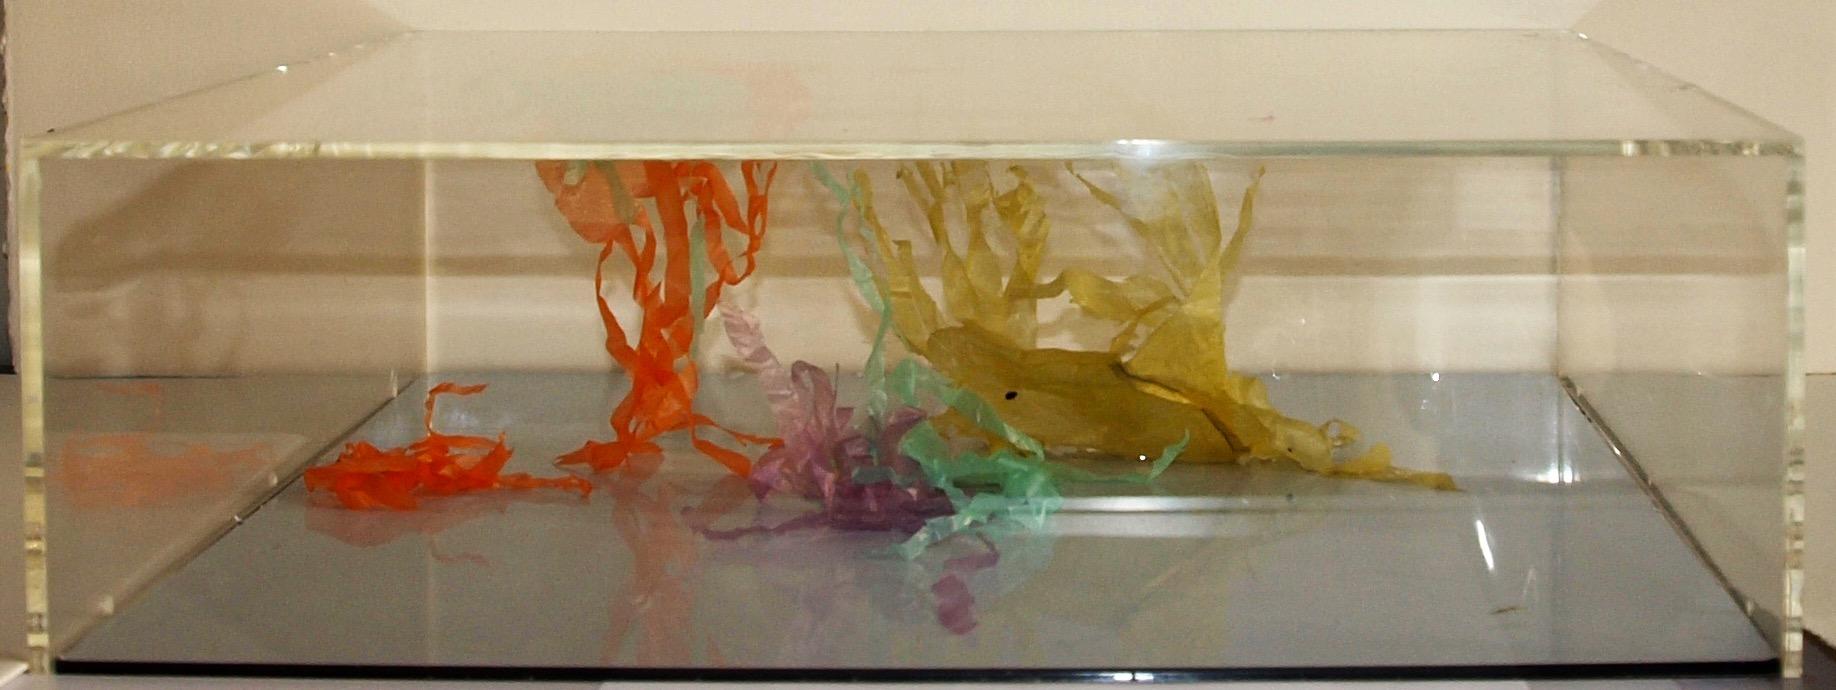 L'aquarium des méduses 80/60  2009